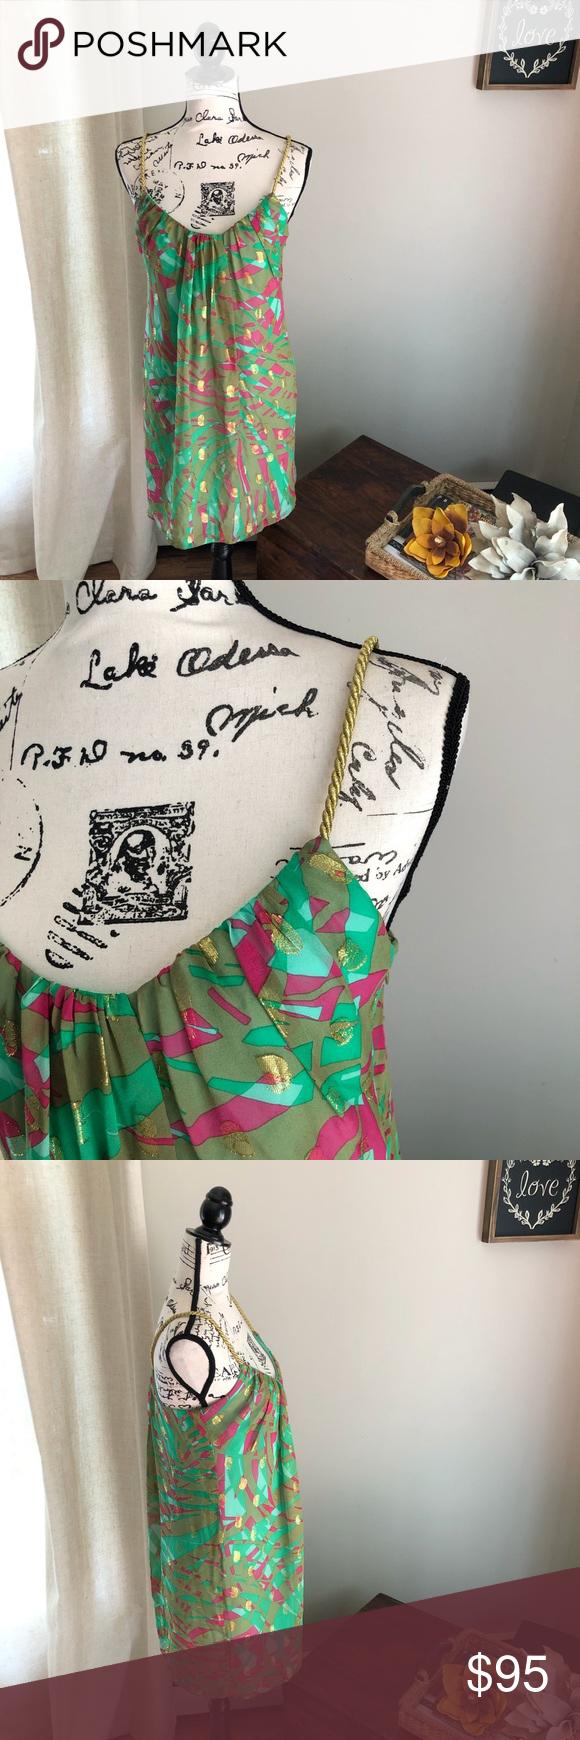 An Original Milly New York Silk Metallic Dress Absolutely gorgeous quality & style. Tropical pattern mini dress